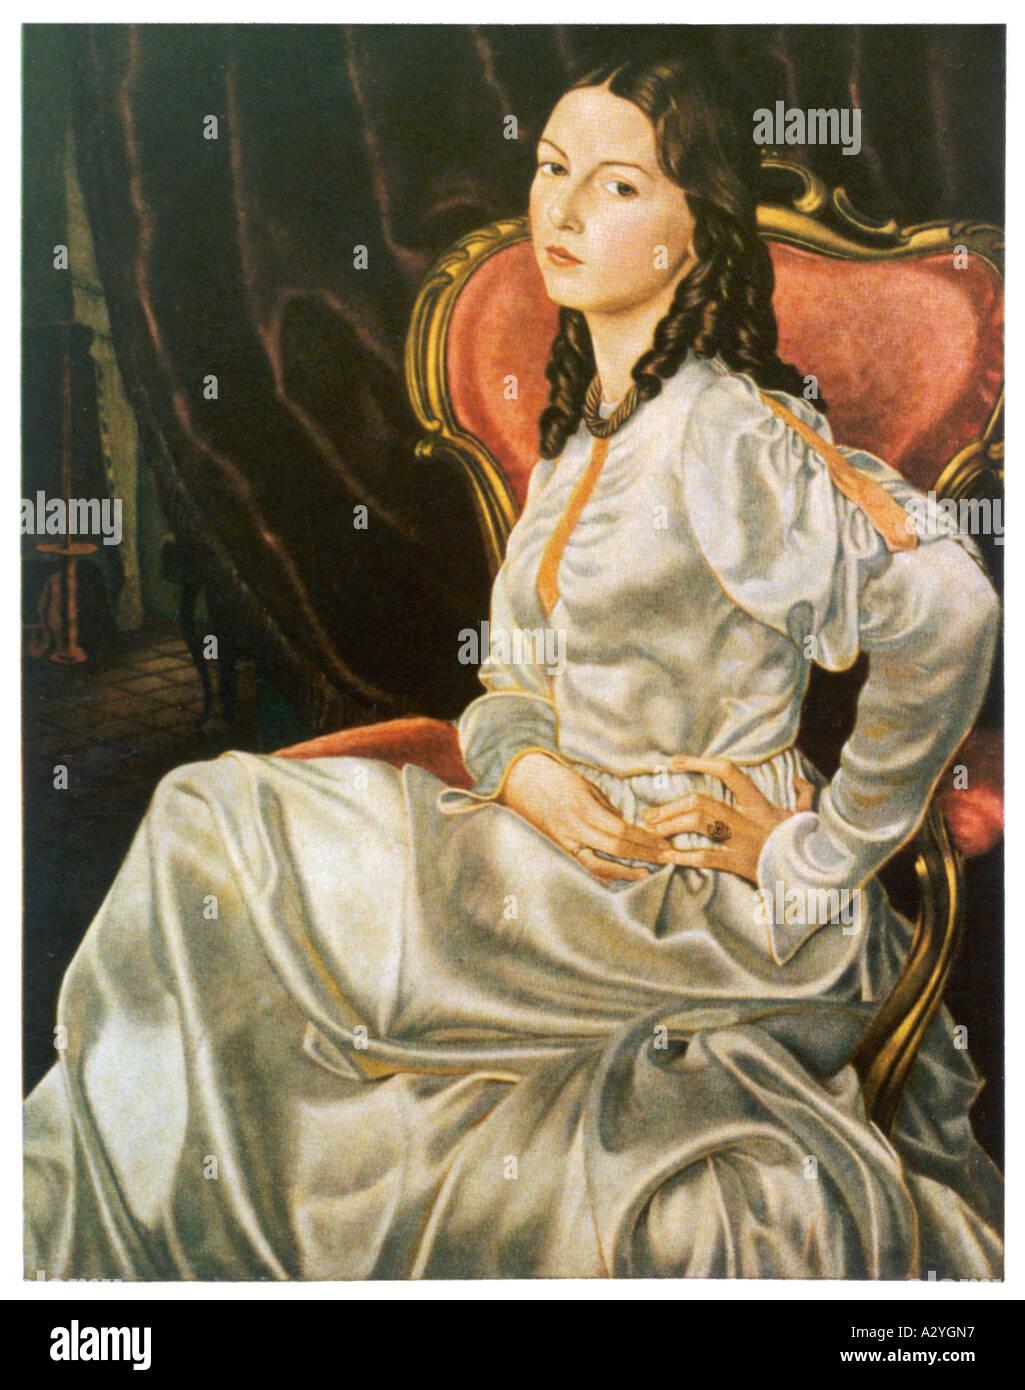 German Woman 1860 Stock Photo